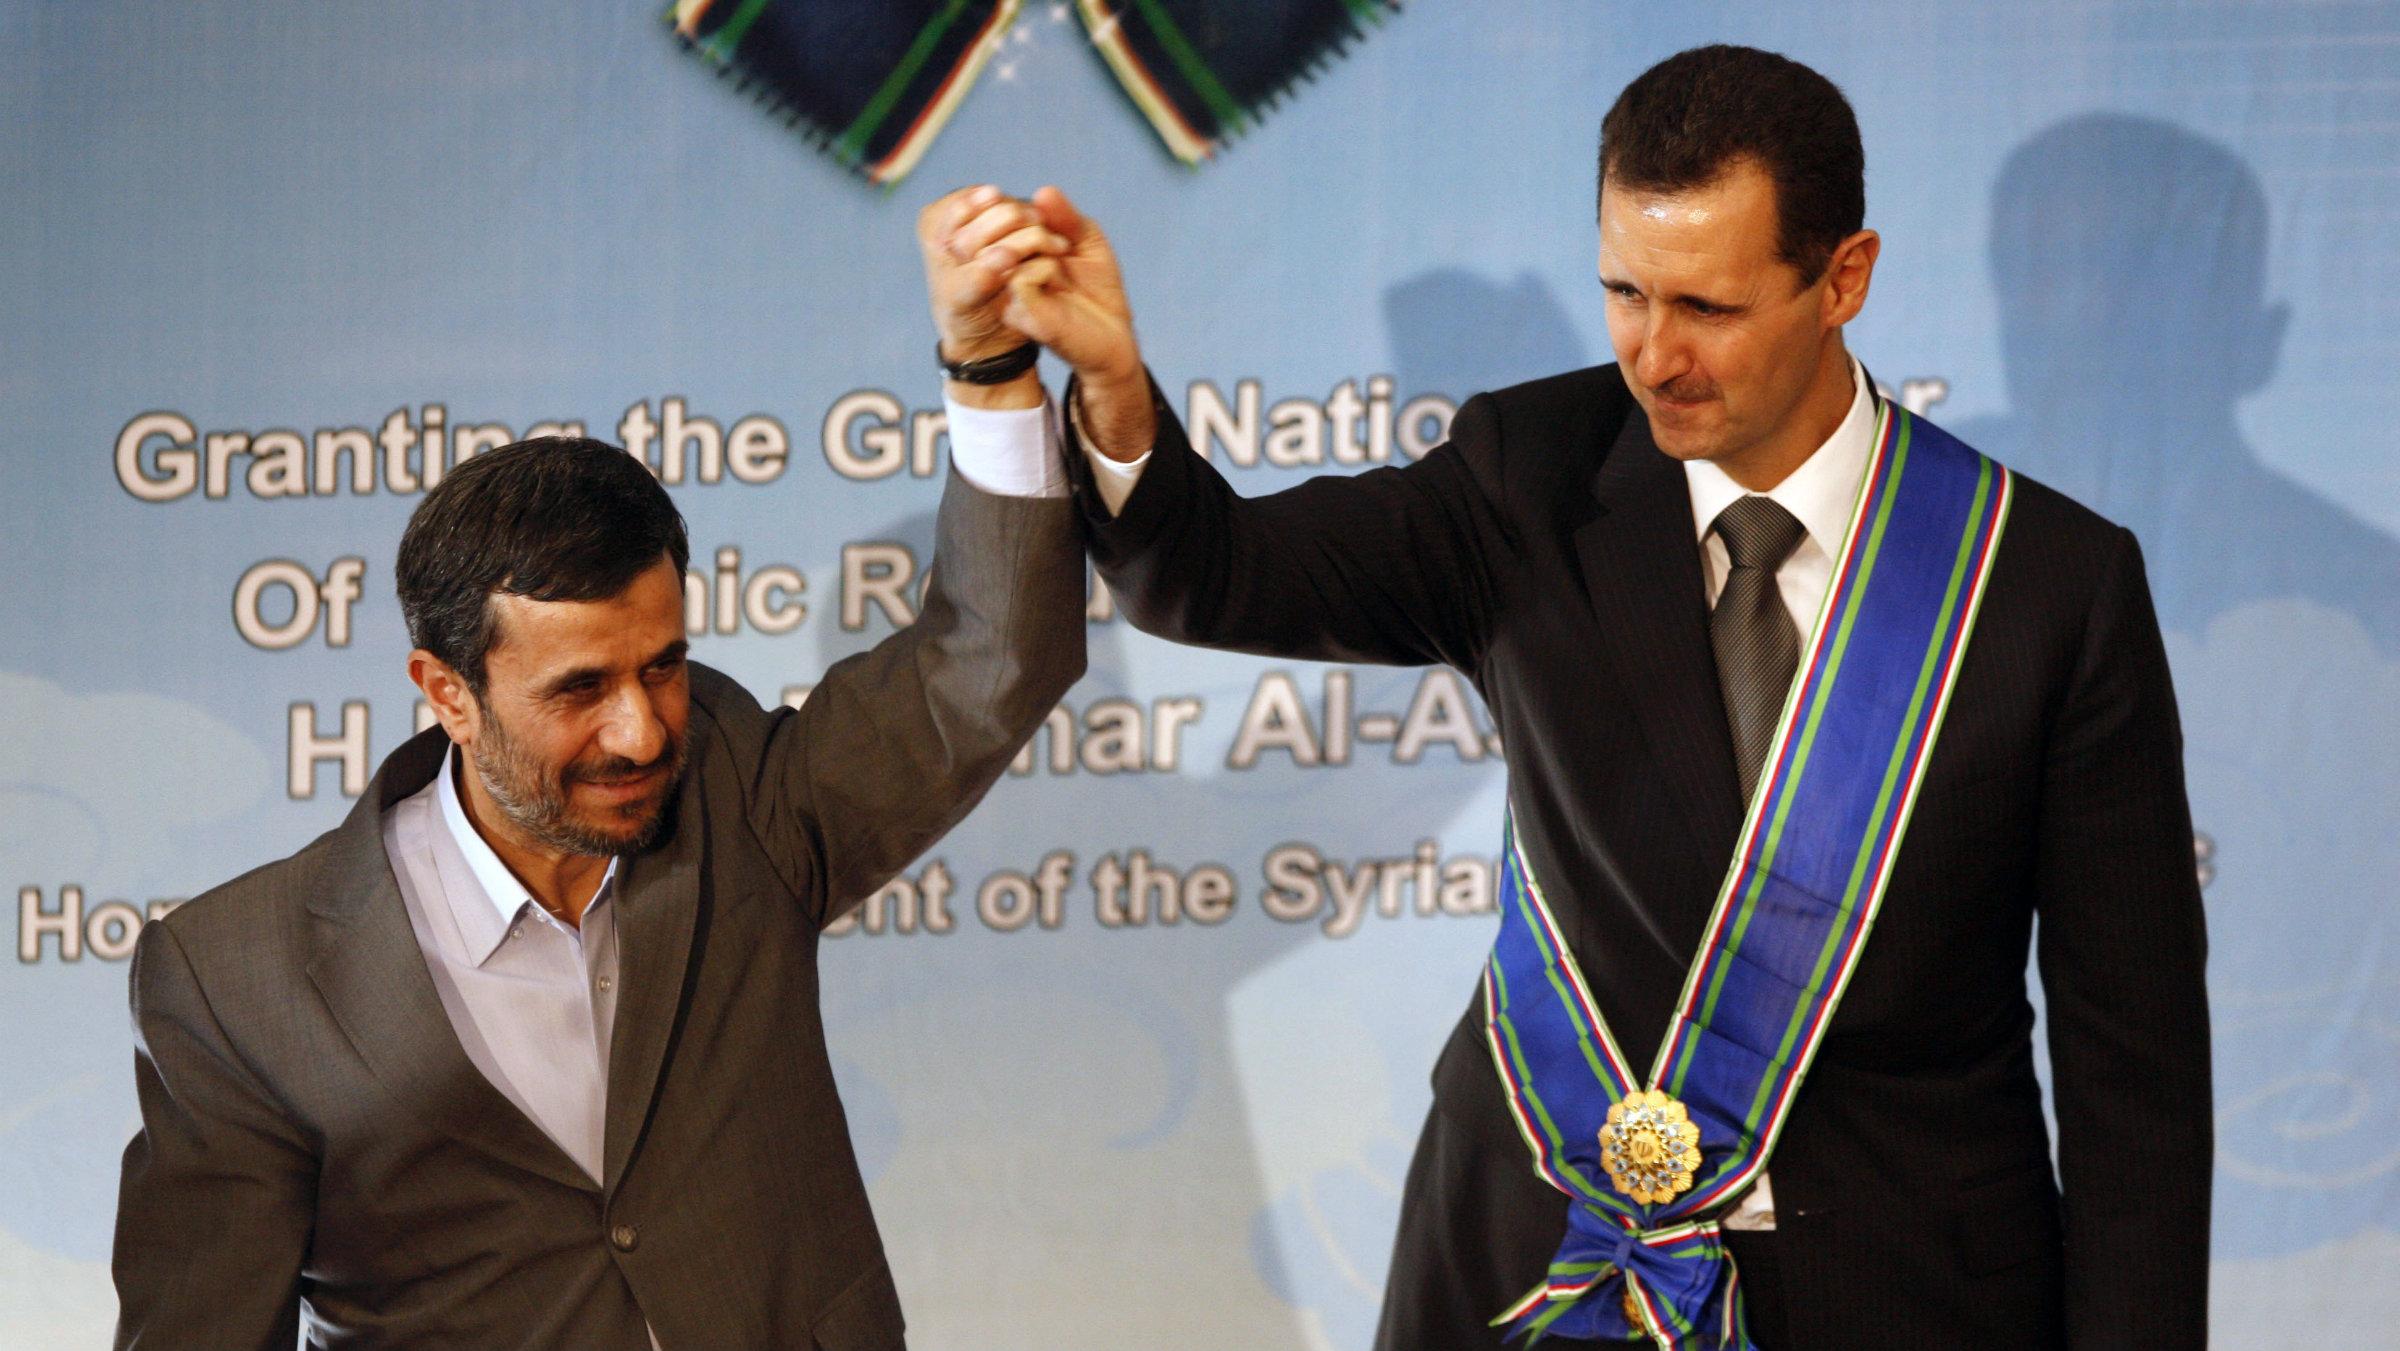 Iran's Mahmoud Ahmadinejad, left, and Syria's Bashar Assad